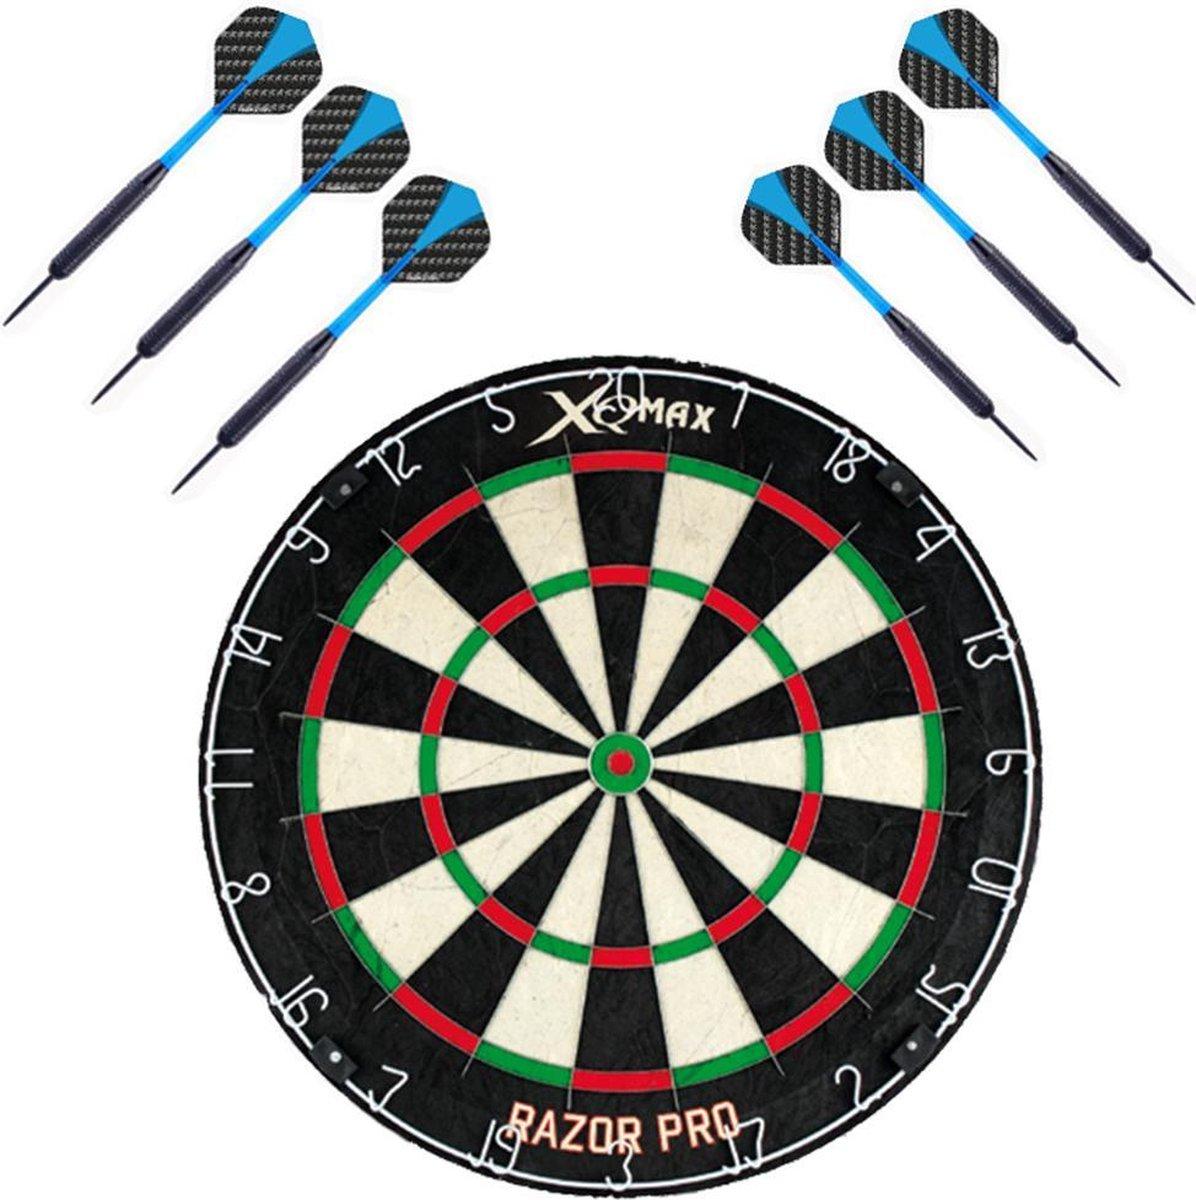 XQ-Max Razor PRO - darbord - inclusief - 2 sets - dartpijlen